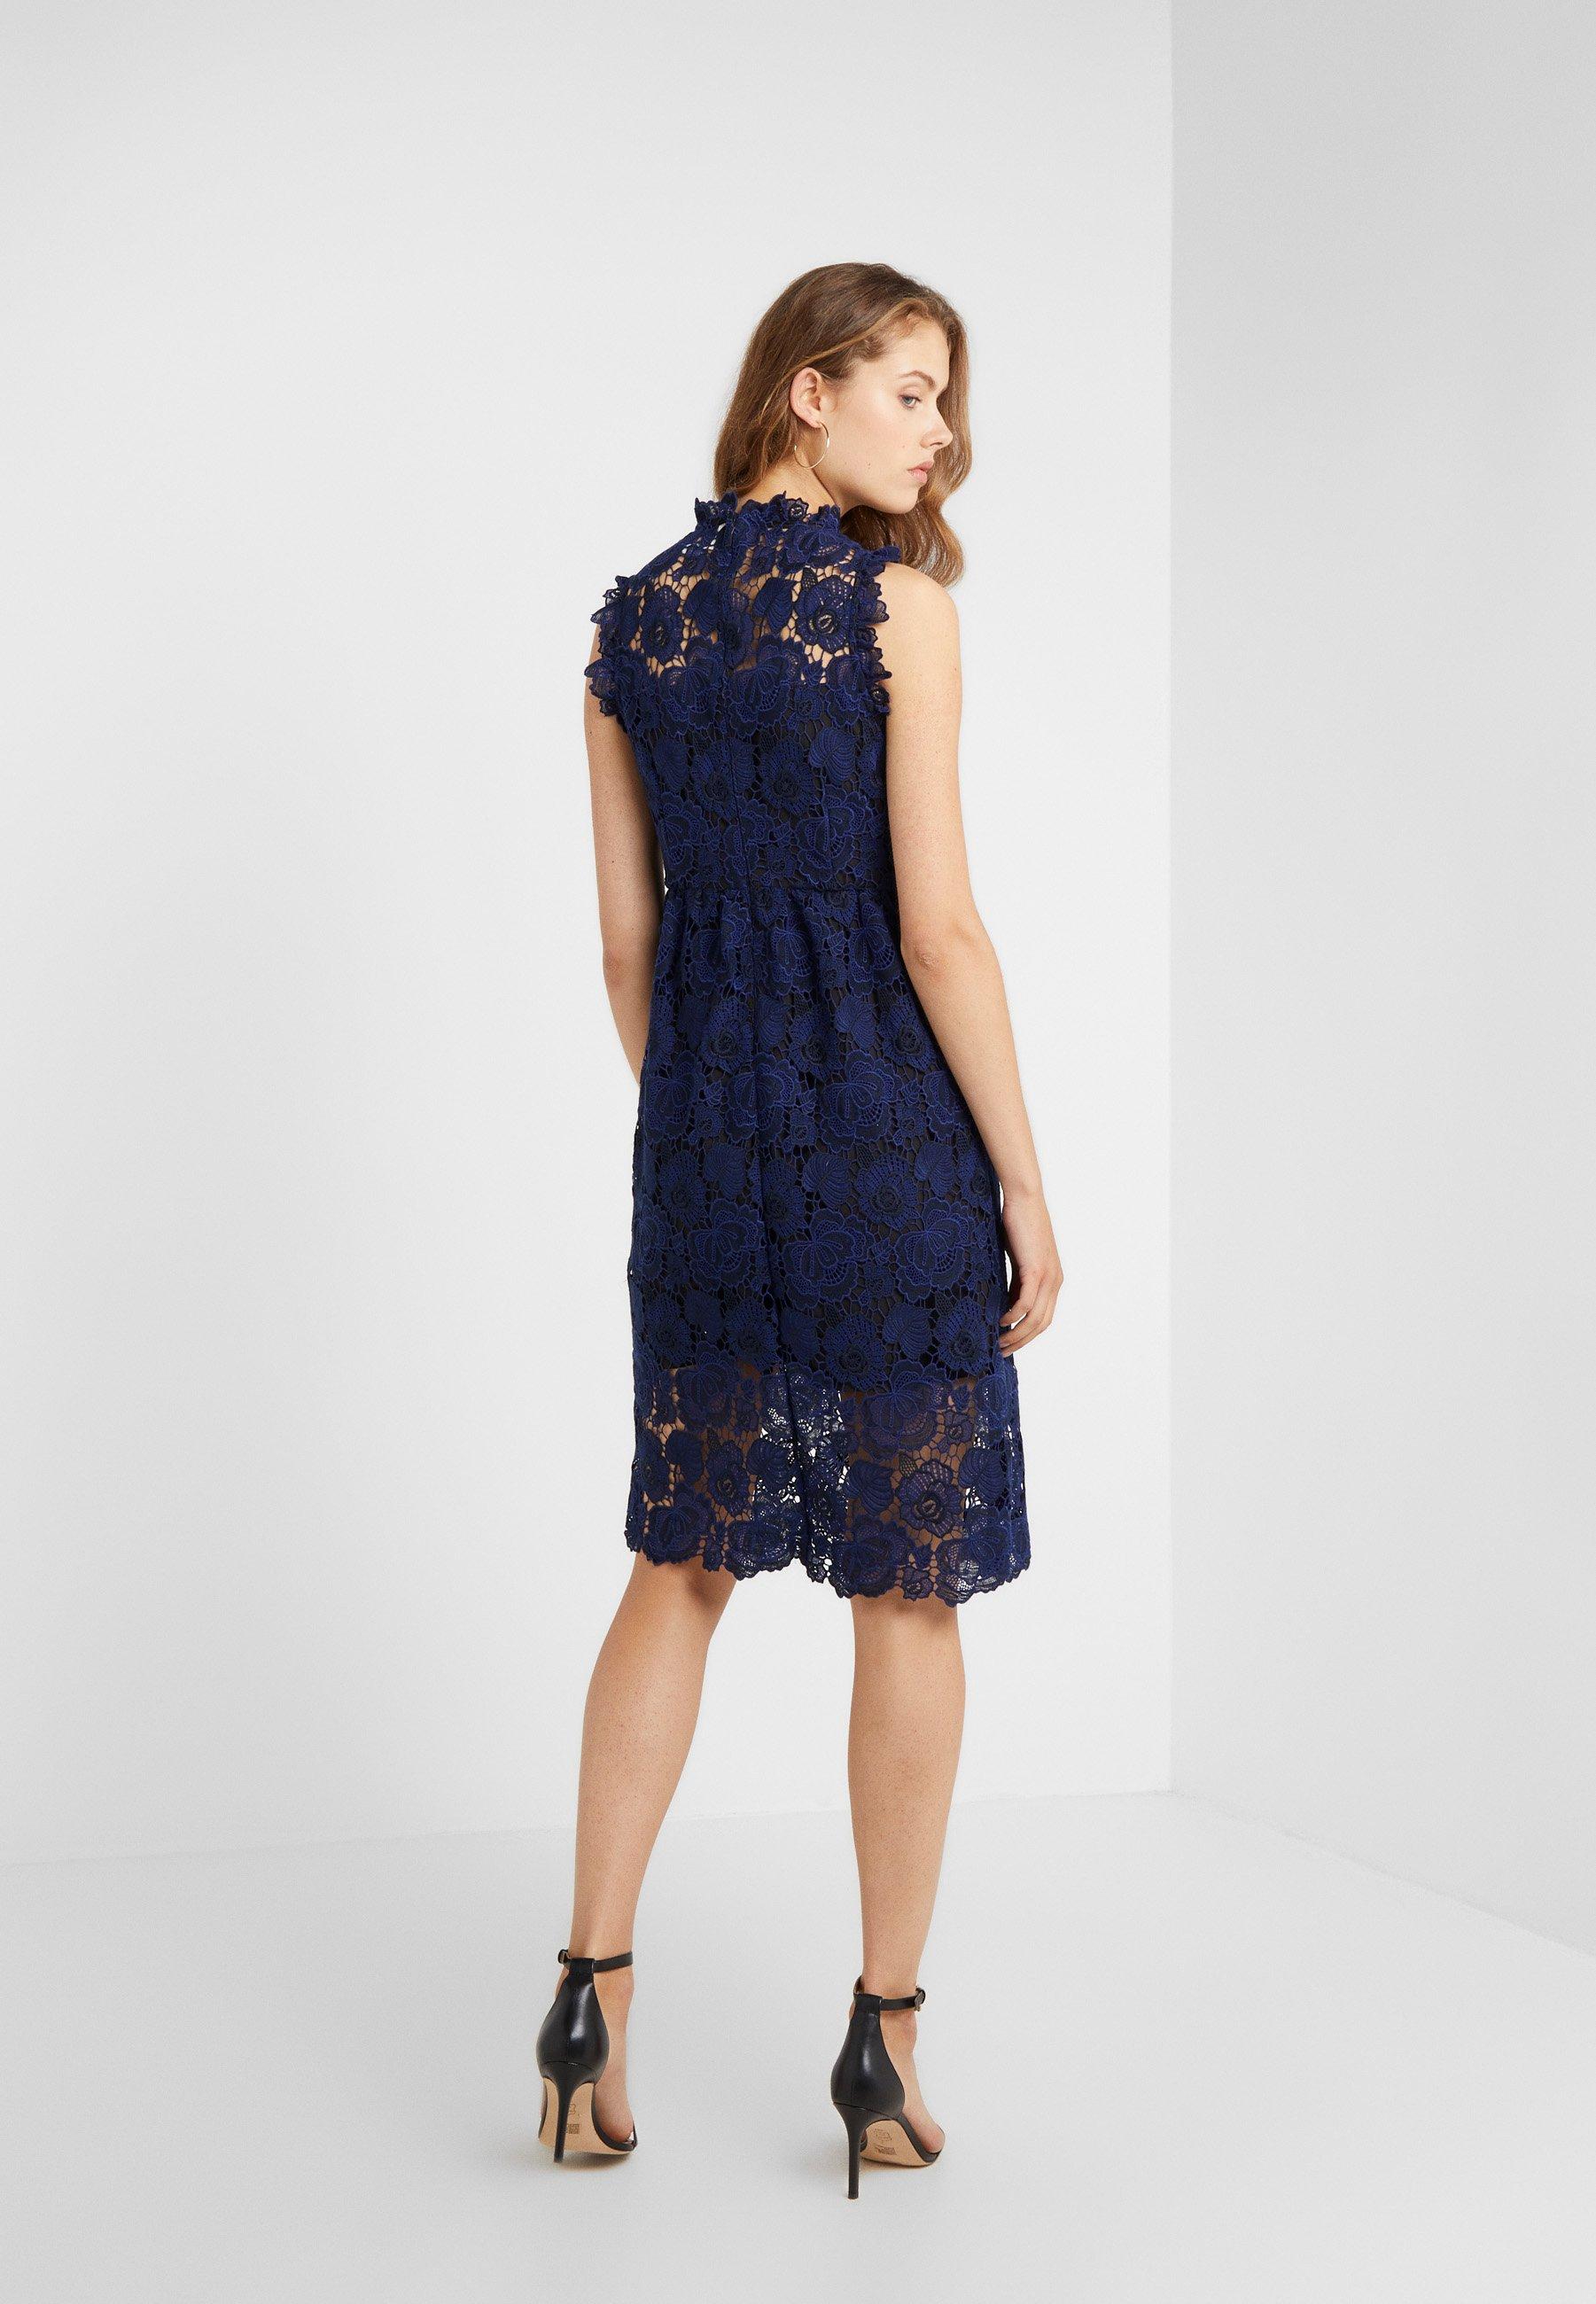 kate spade new york Vestito elegante - blu scuro blueink